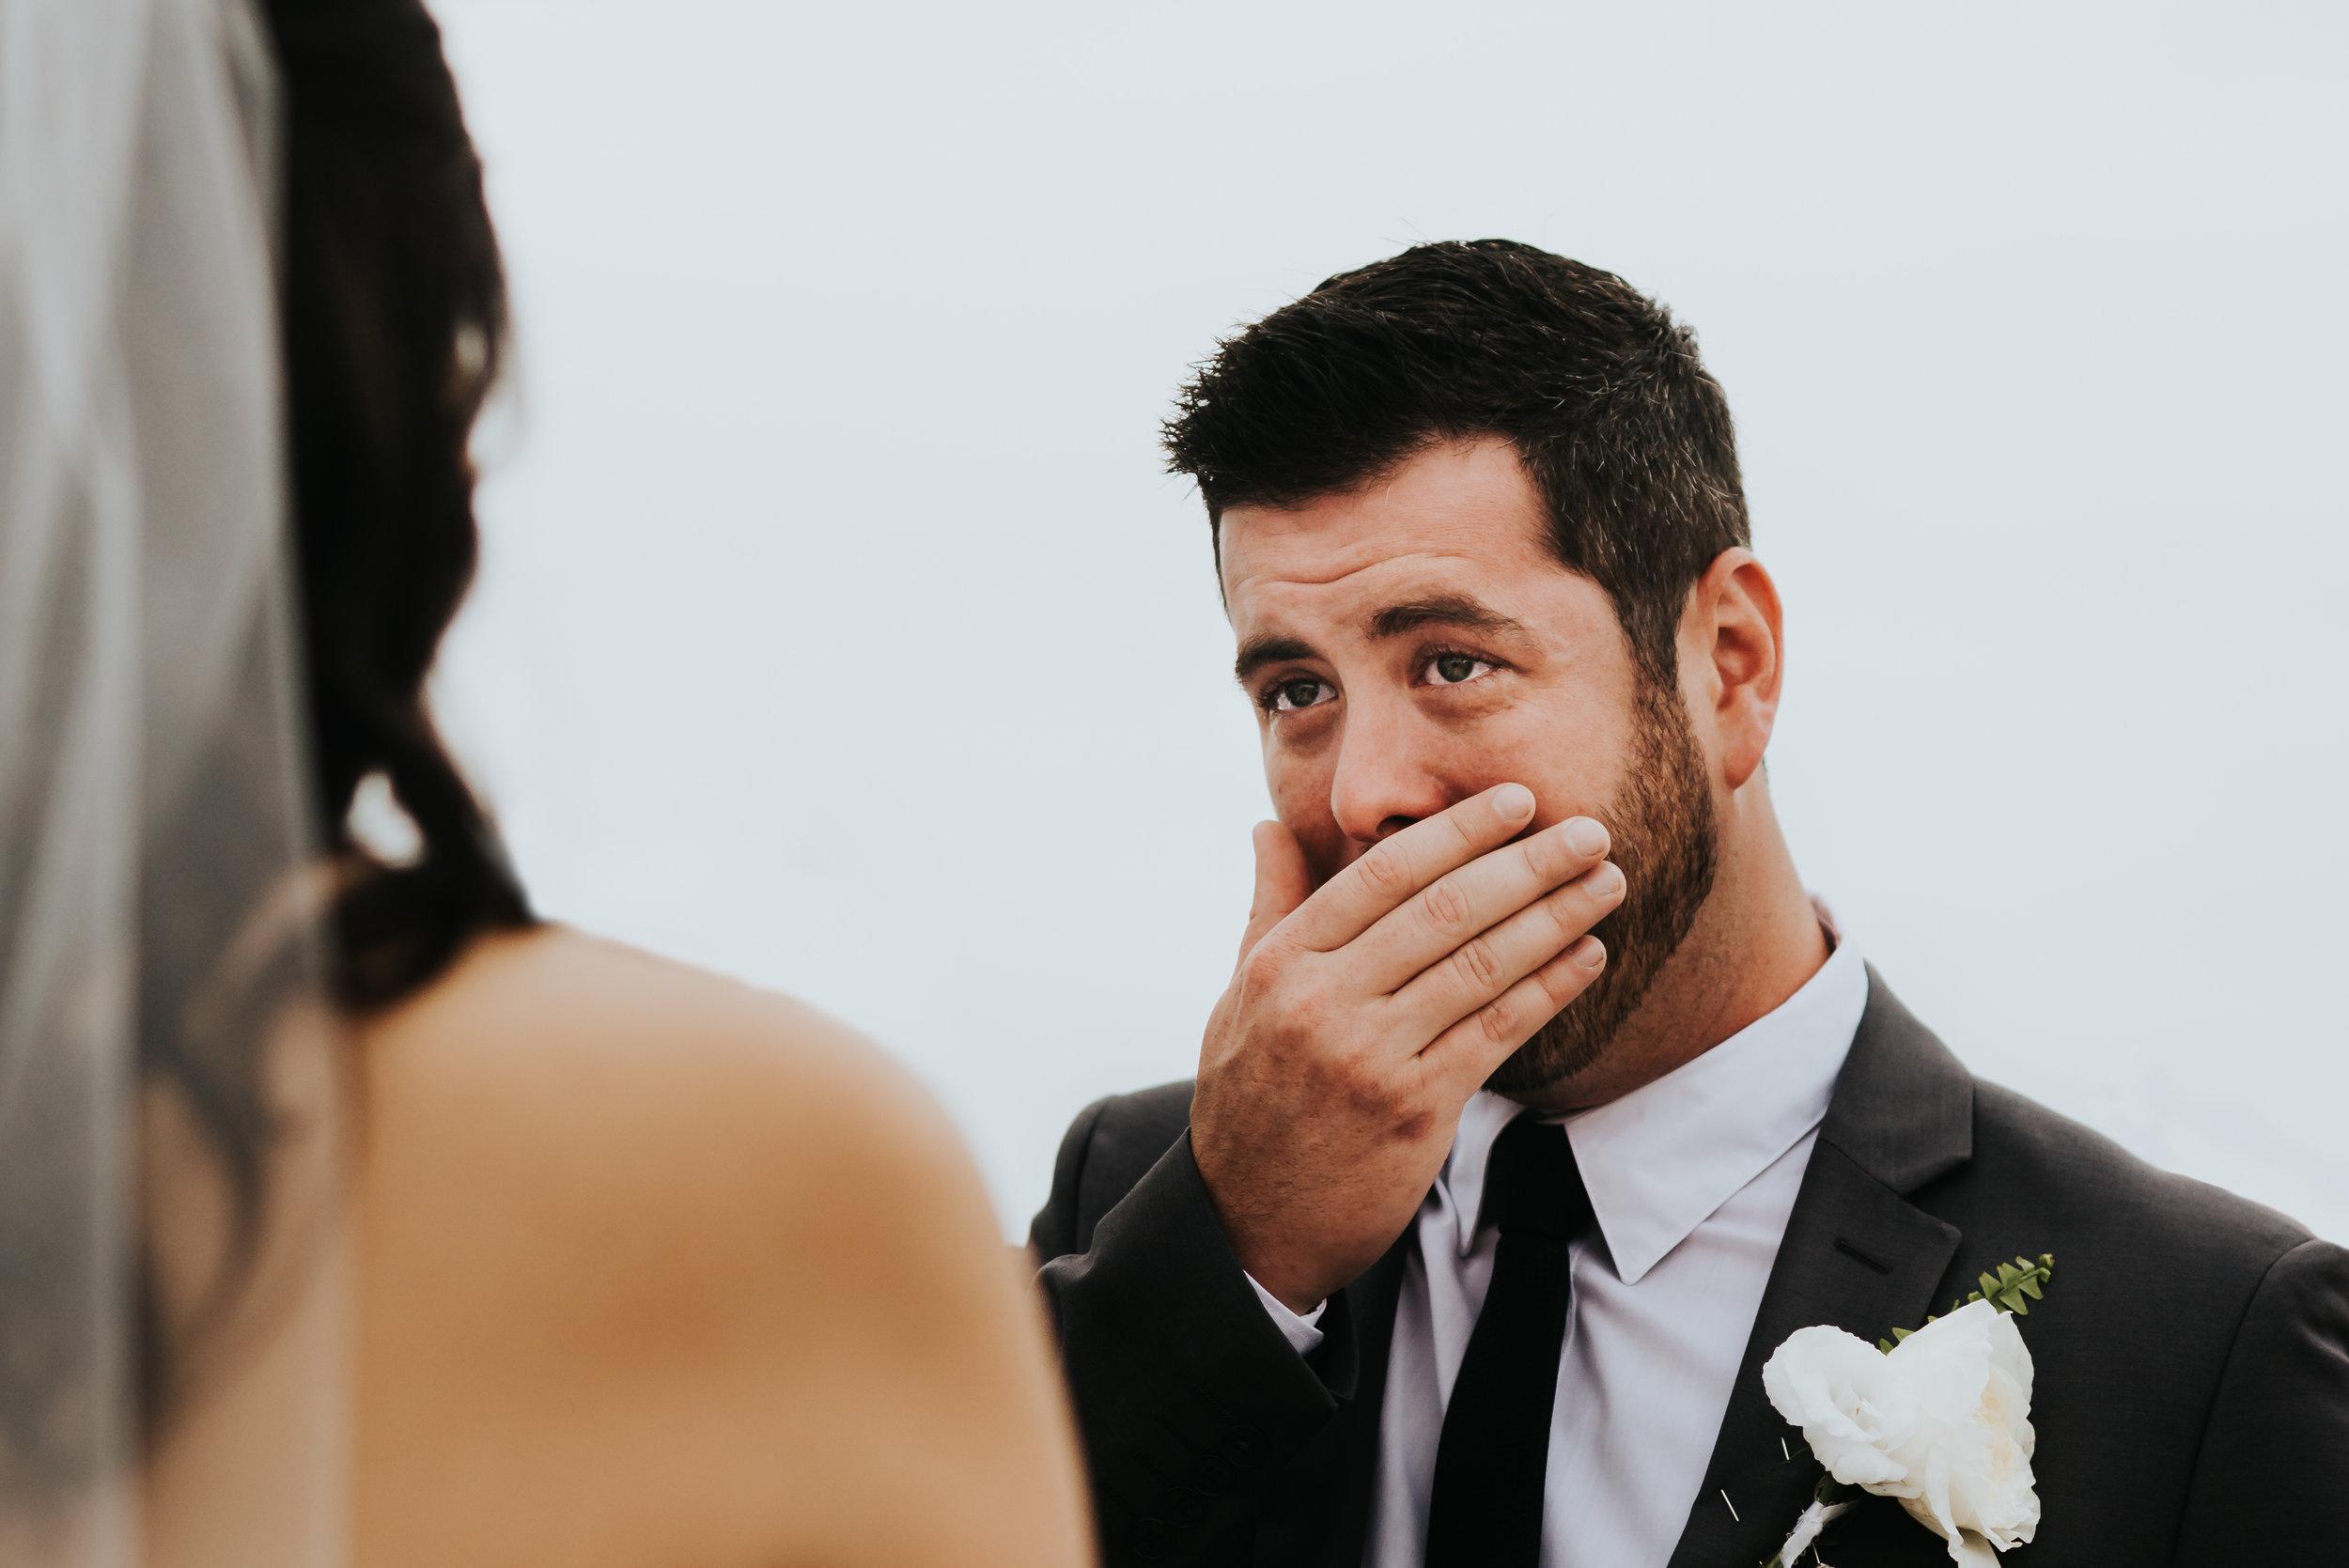 kelowna-wedding-photographer-10.jpg